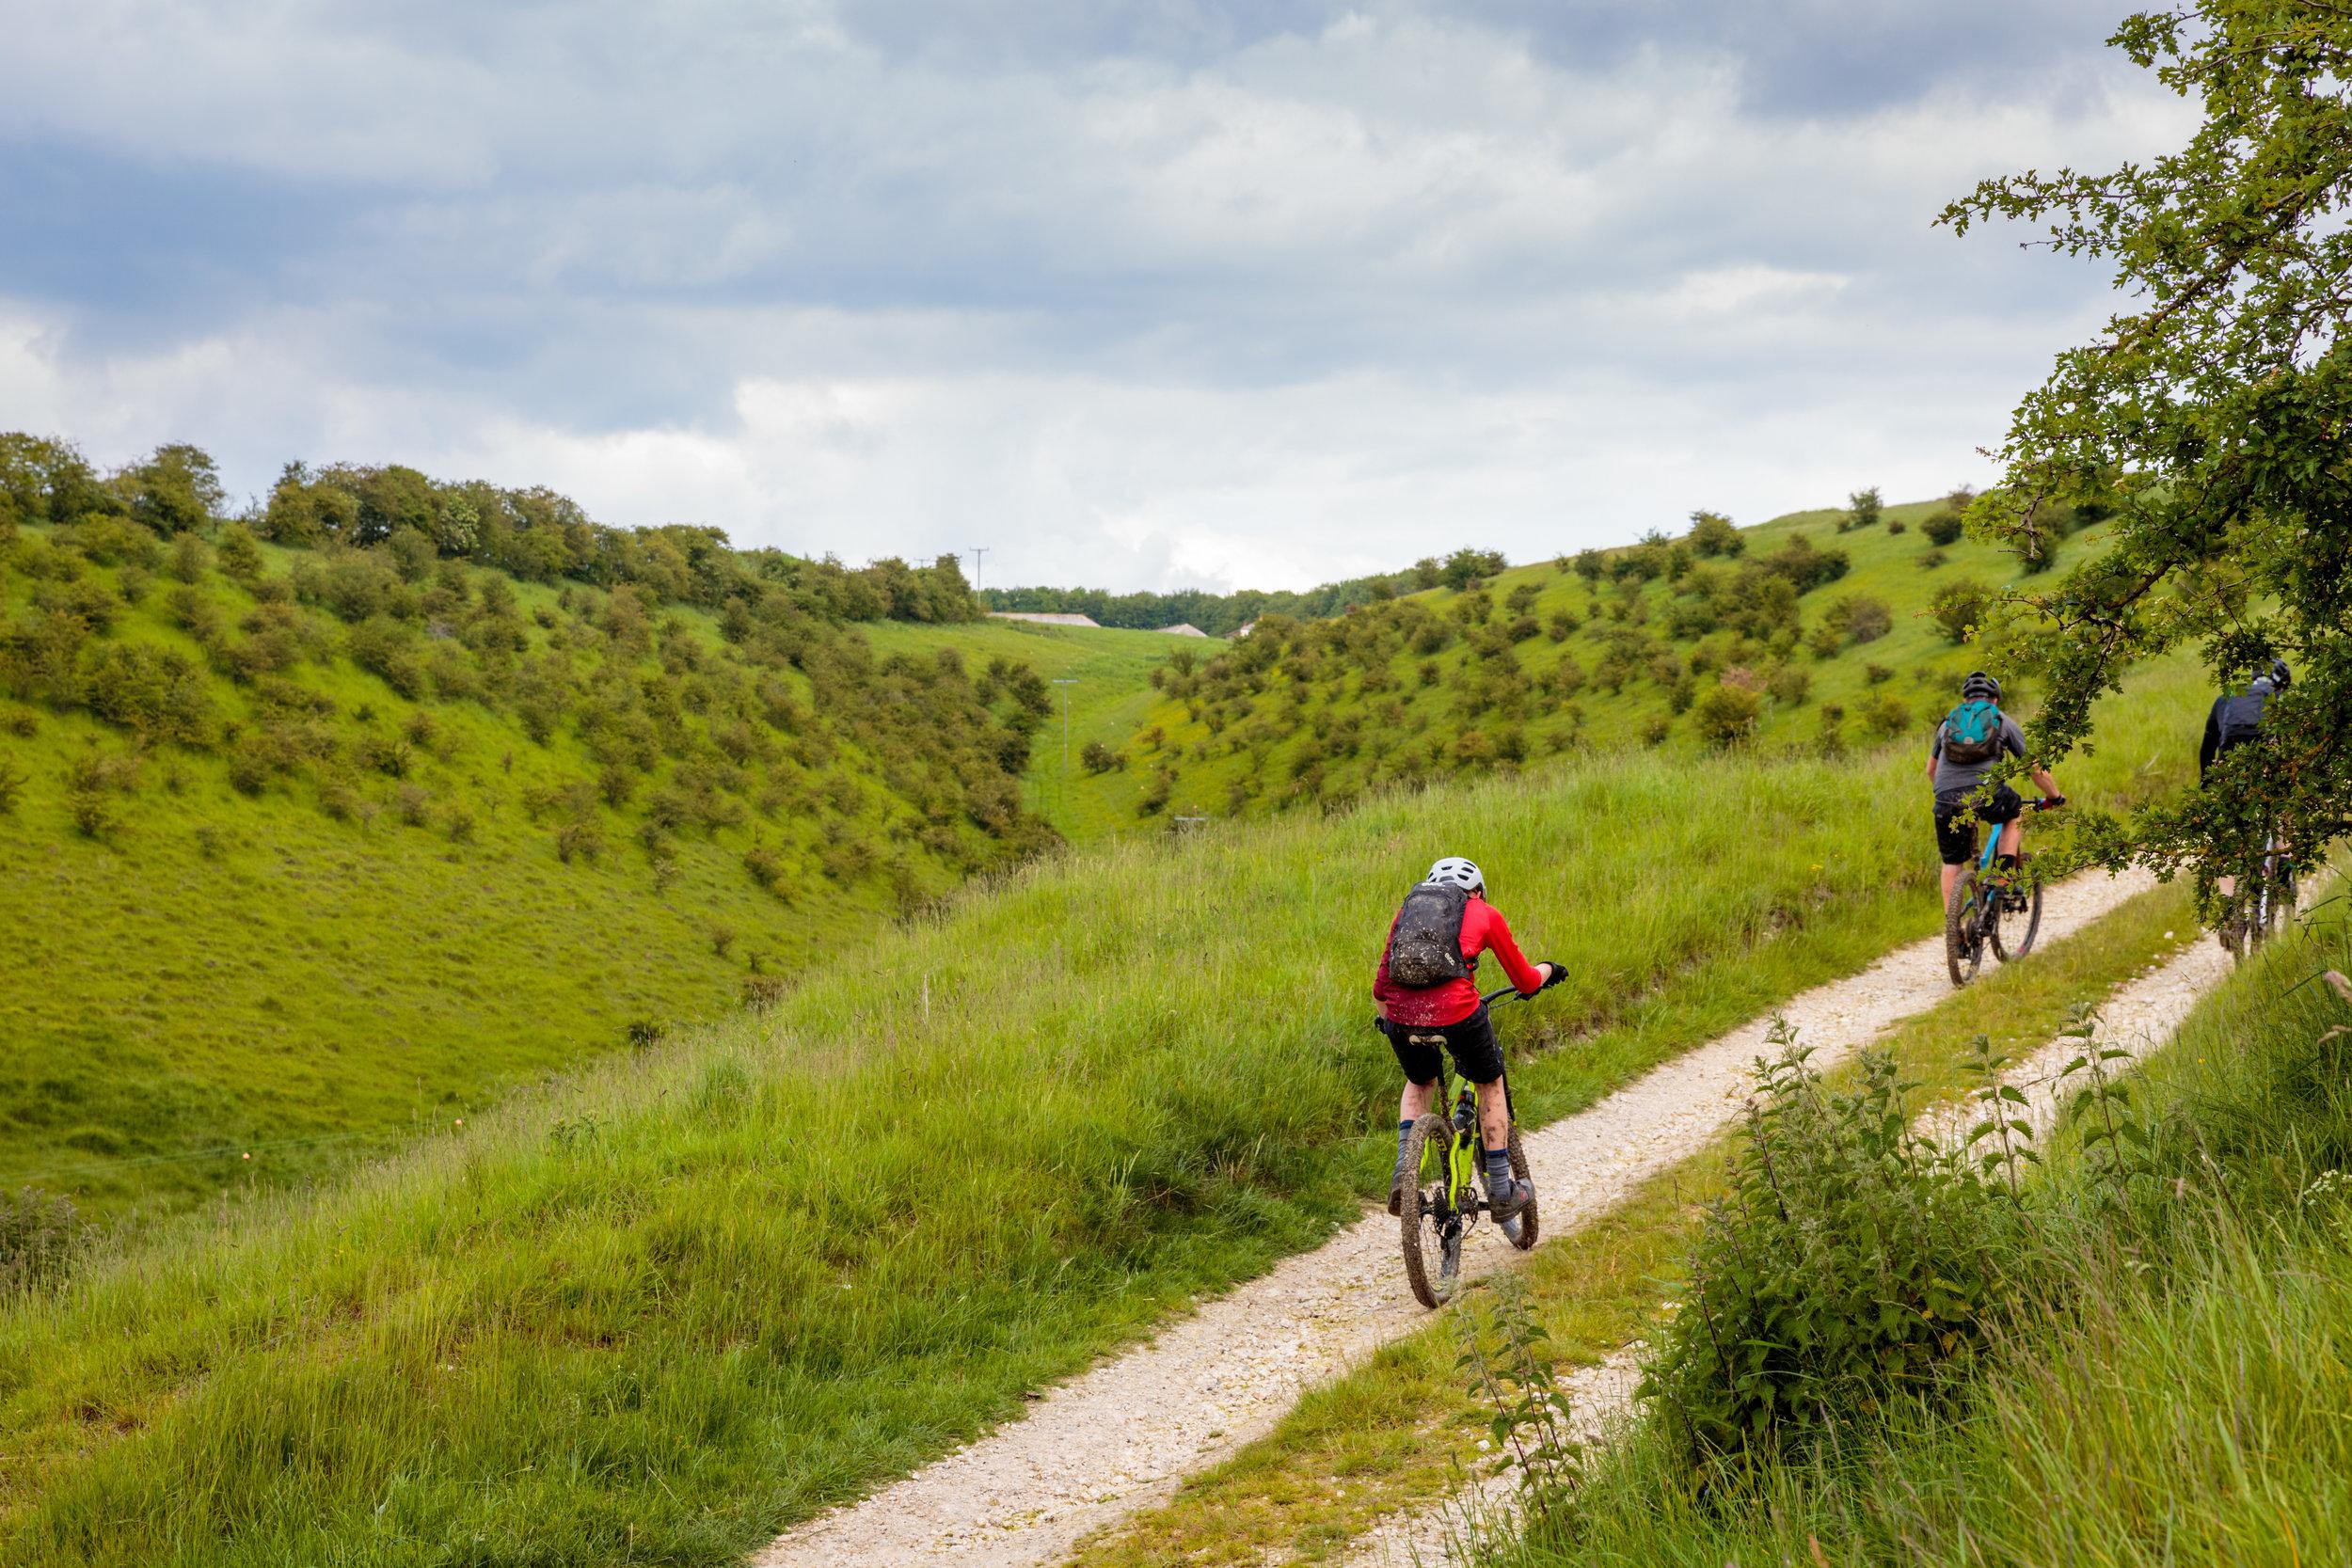 Mountain Biking Uphill in Yorkshire